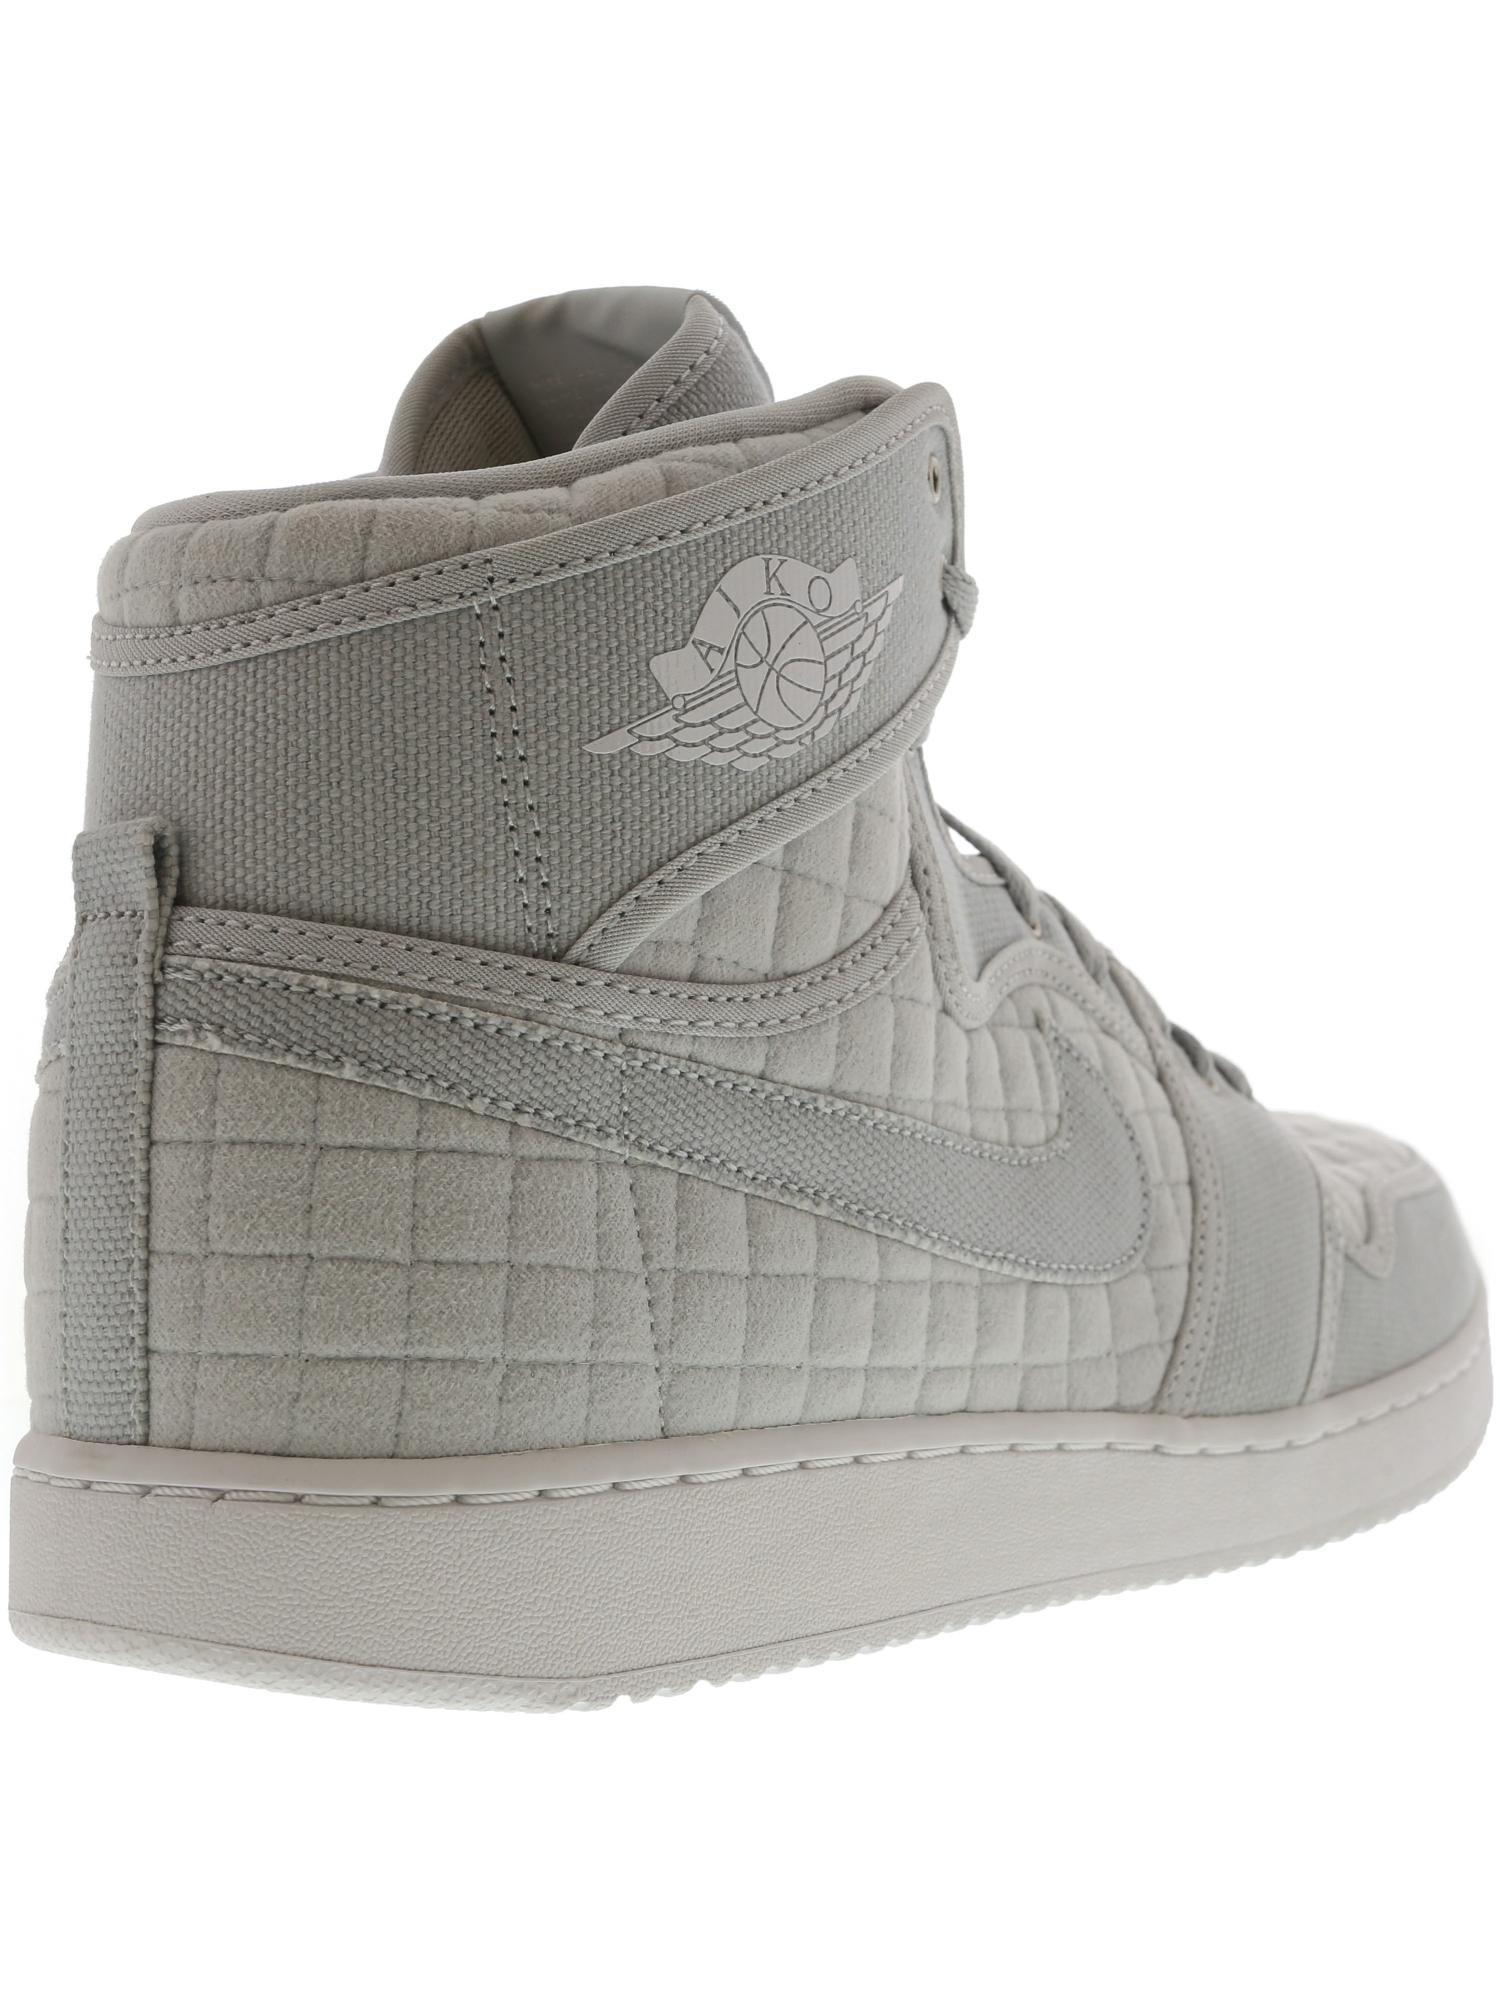 Nike Men's Air Jordan 1 Ko Ko Ko High Og High-Top Canvas Fashion Sneaker 5237eb